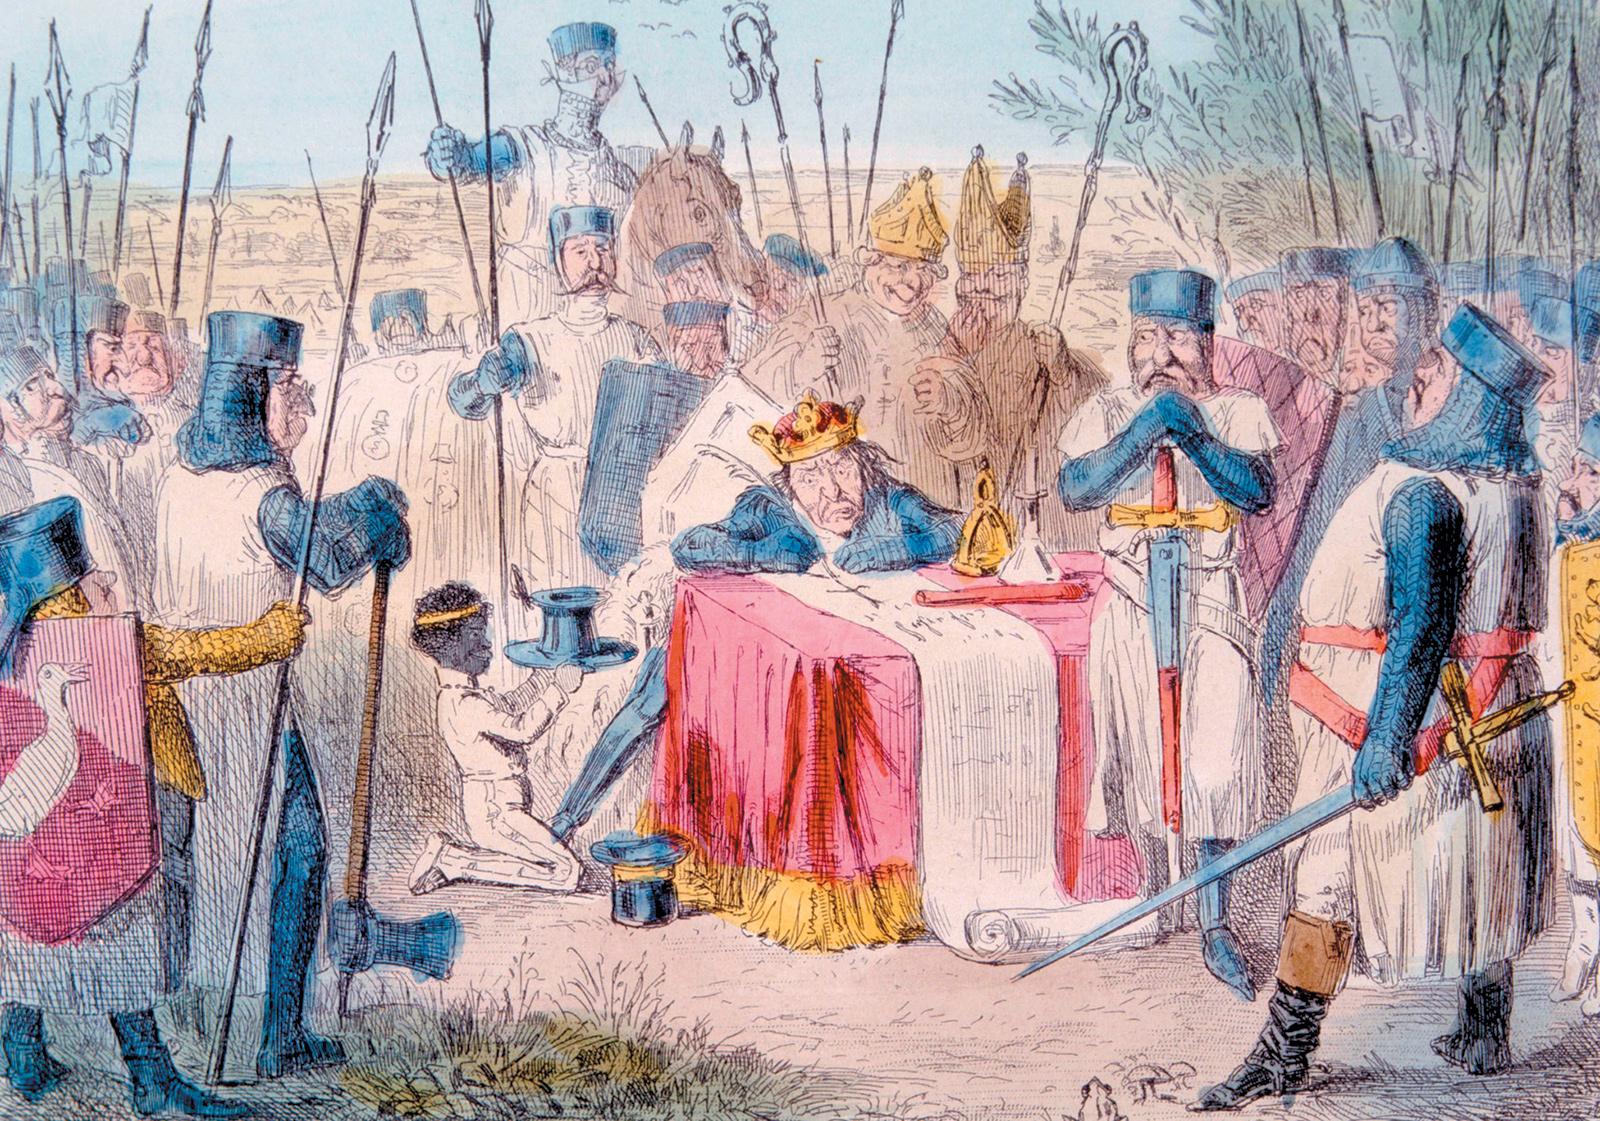 King John of England approving the Magna Carta in 1215; illustration by John Leech, 1875